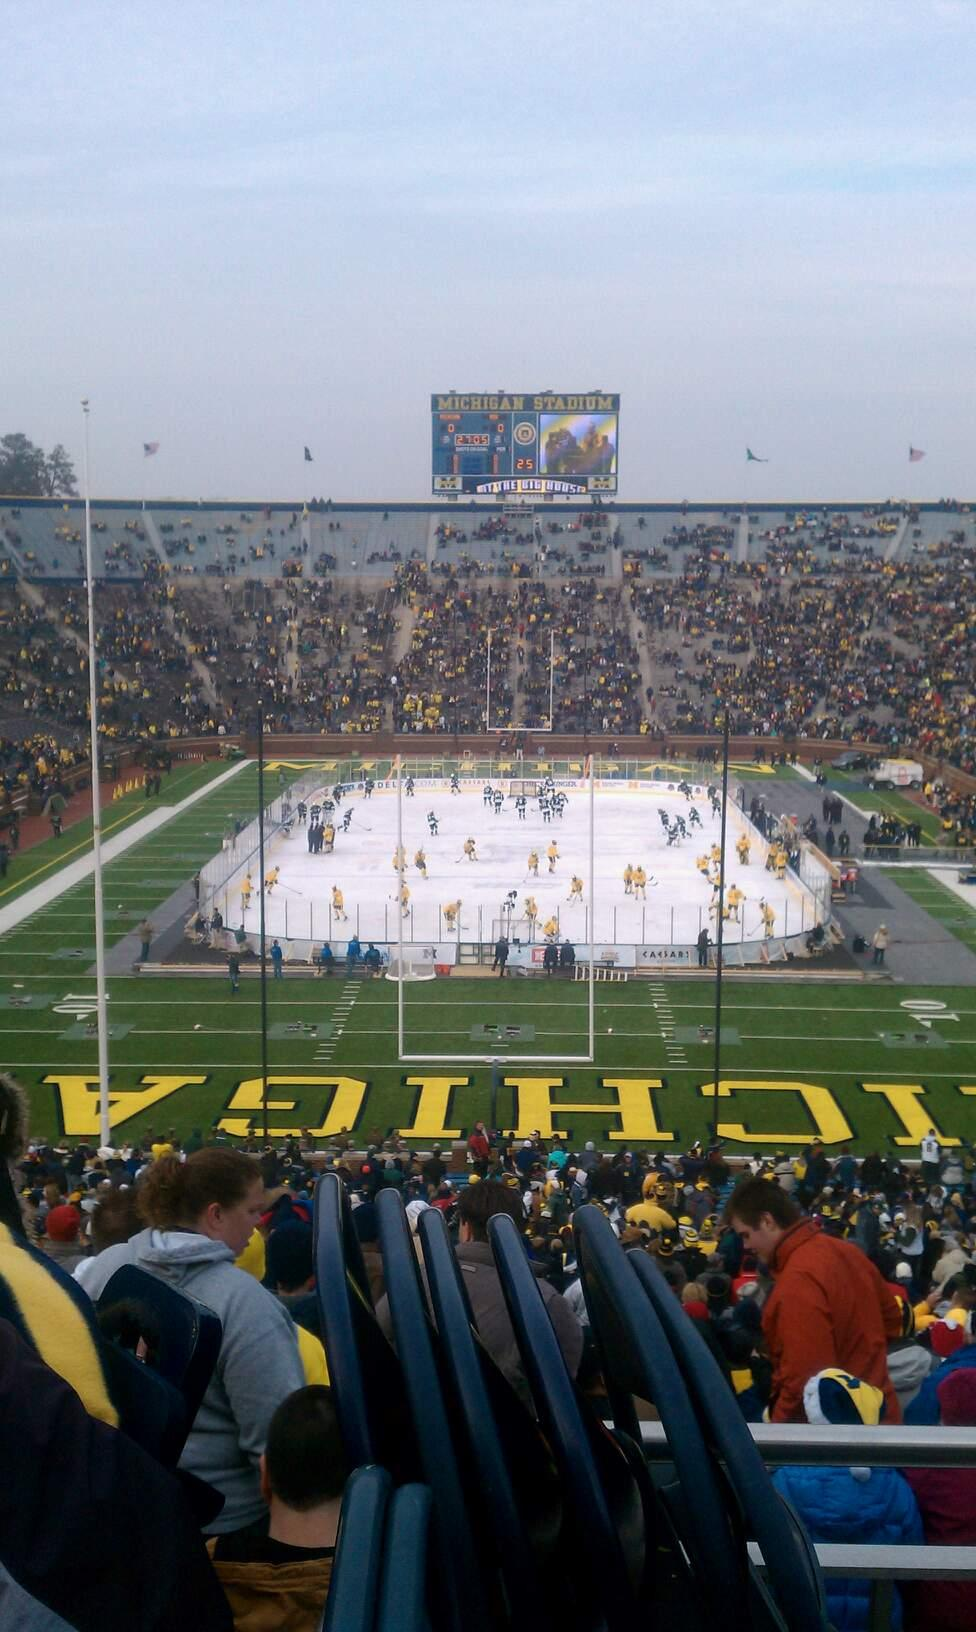 Michigan Stadium Section 12 Row 40 Seat 1